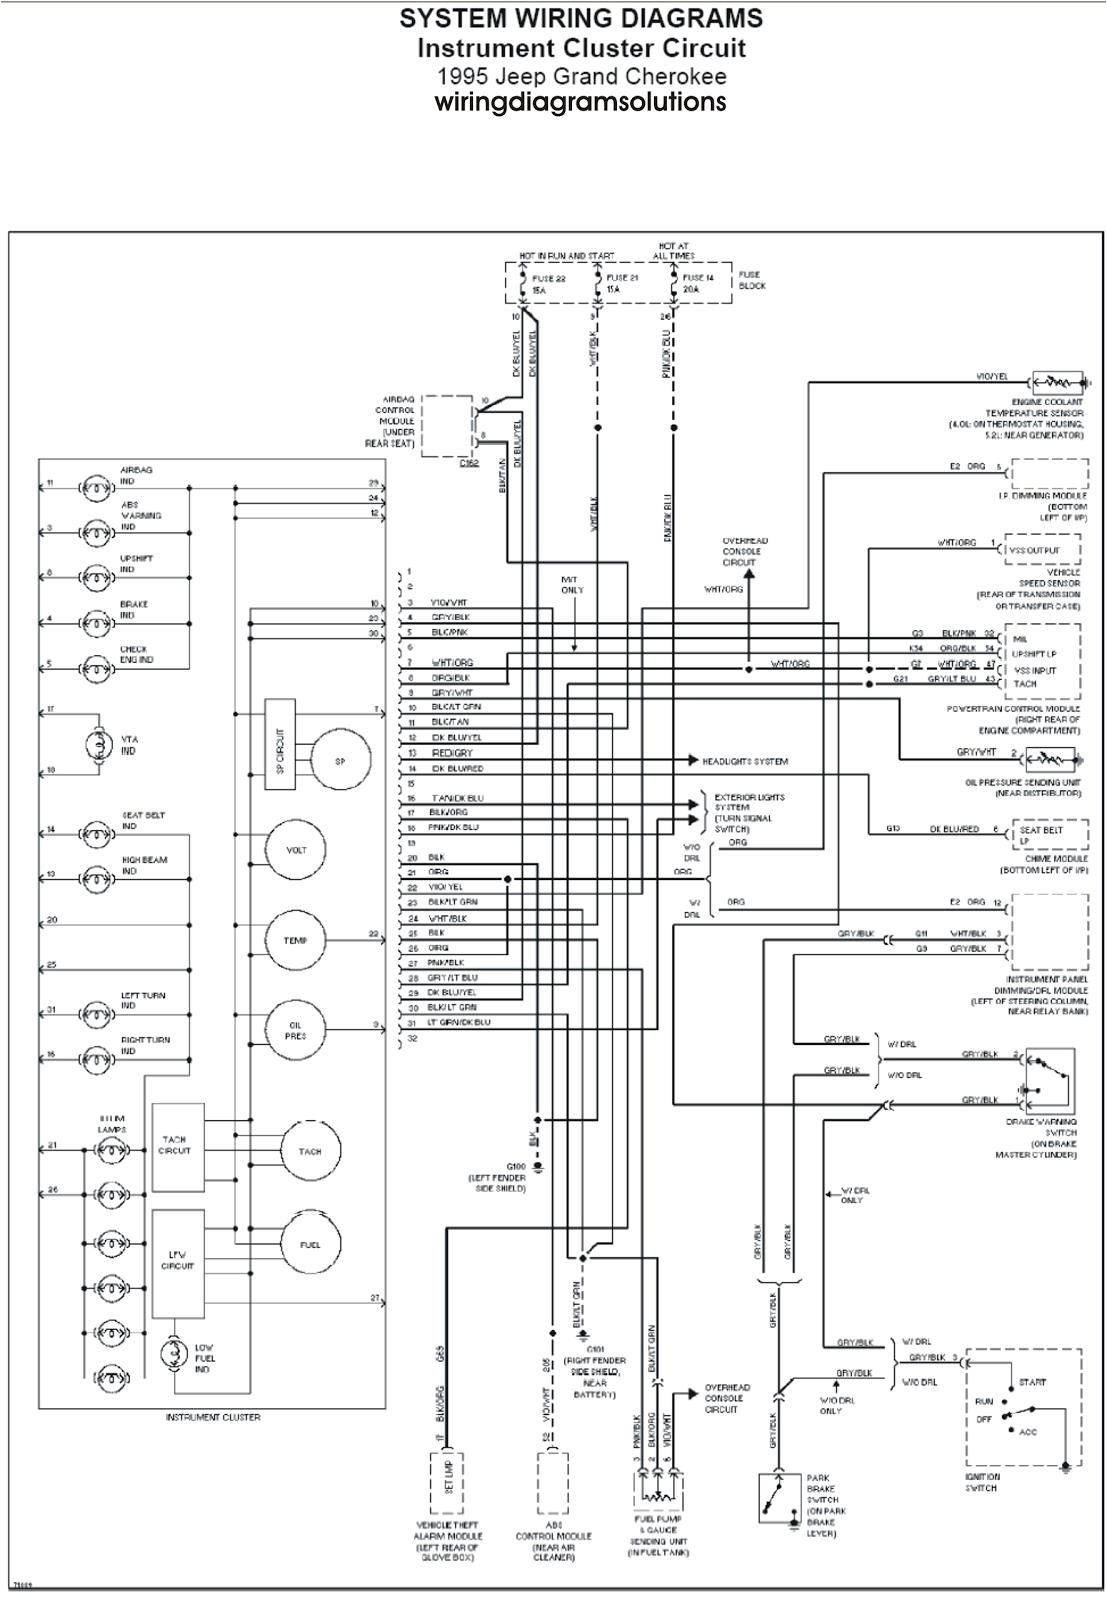 1996 jeep cherokee ecm wiring diagrams wiring diagrams yeszz96 jeep cherokee pcm wiring diagram 11